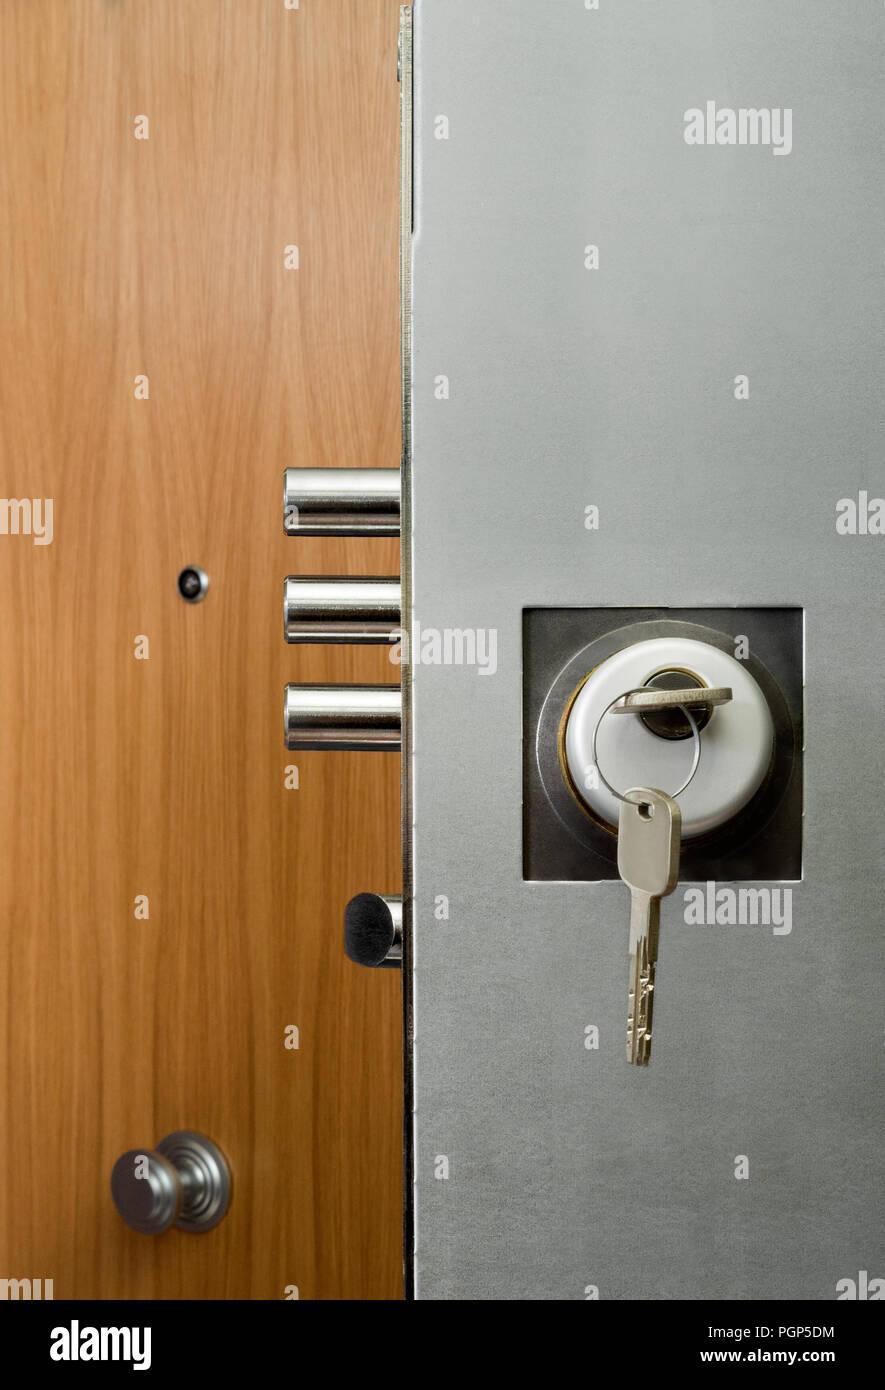 Interior Door Security Lock With Keys Stock Photo 216846160 Alamy